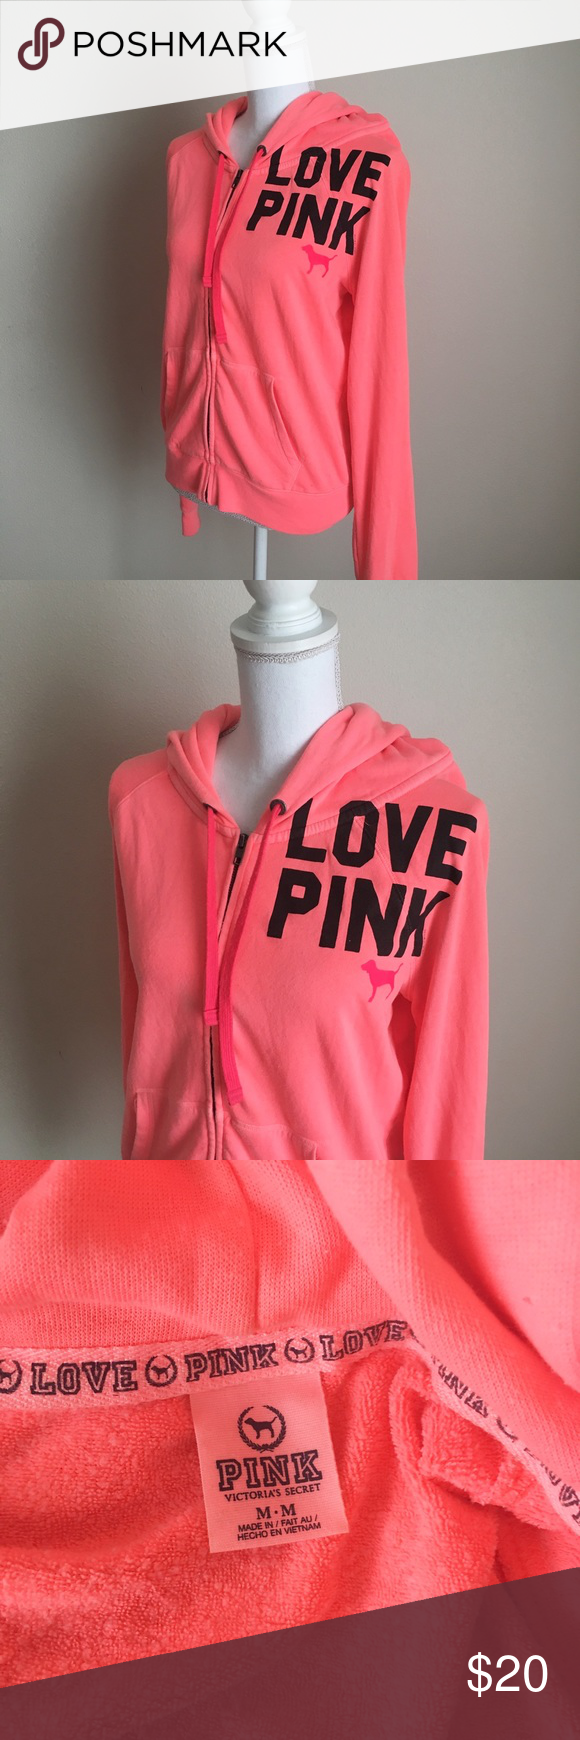 VS PINK Sweatshirt | vs Pink, Sweatshirt and Customer support